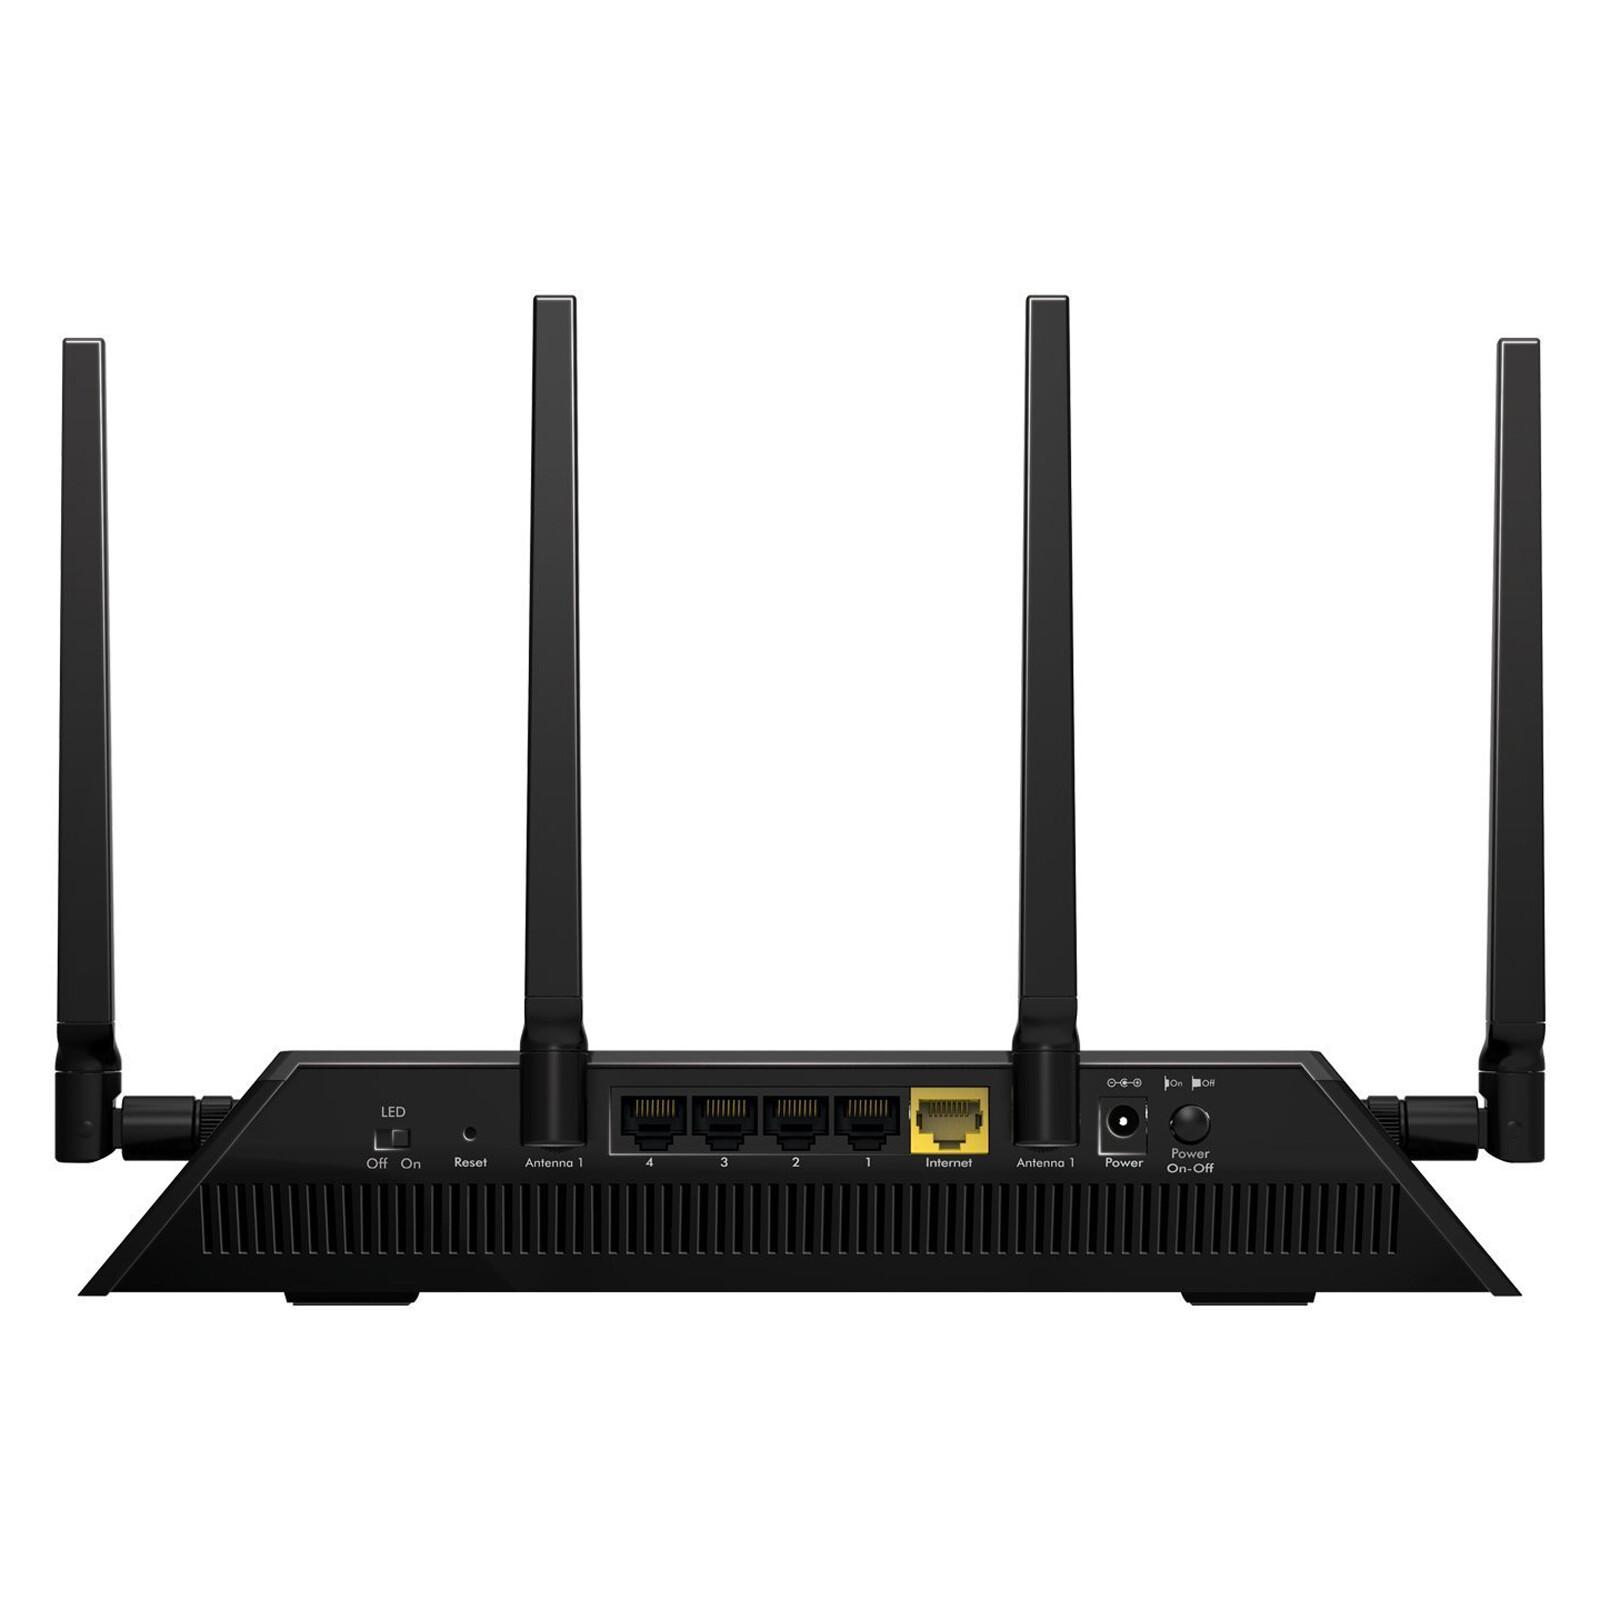 Netgear AC2600 Nighthawk X4S Smart WLAN Gaming Router R7800